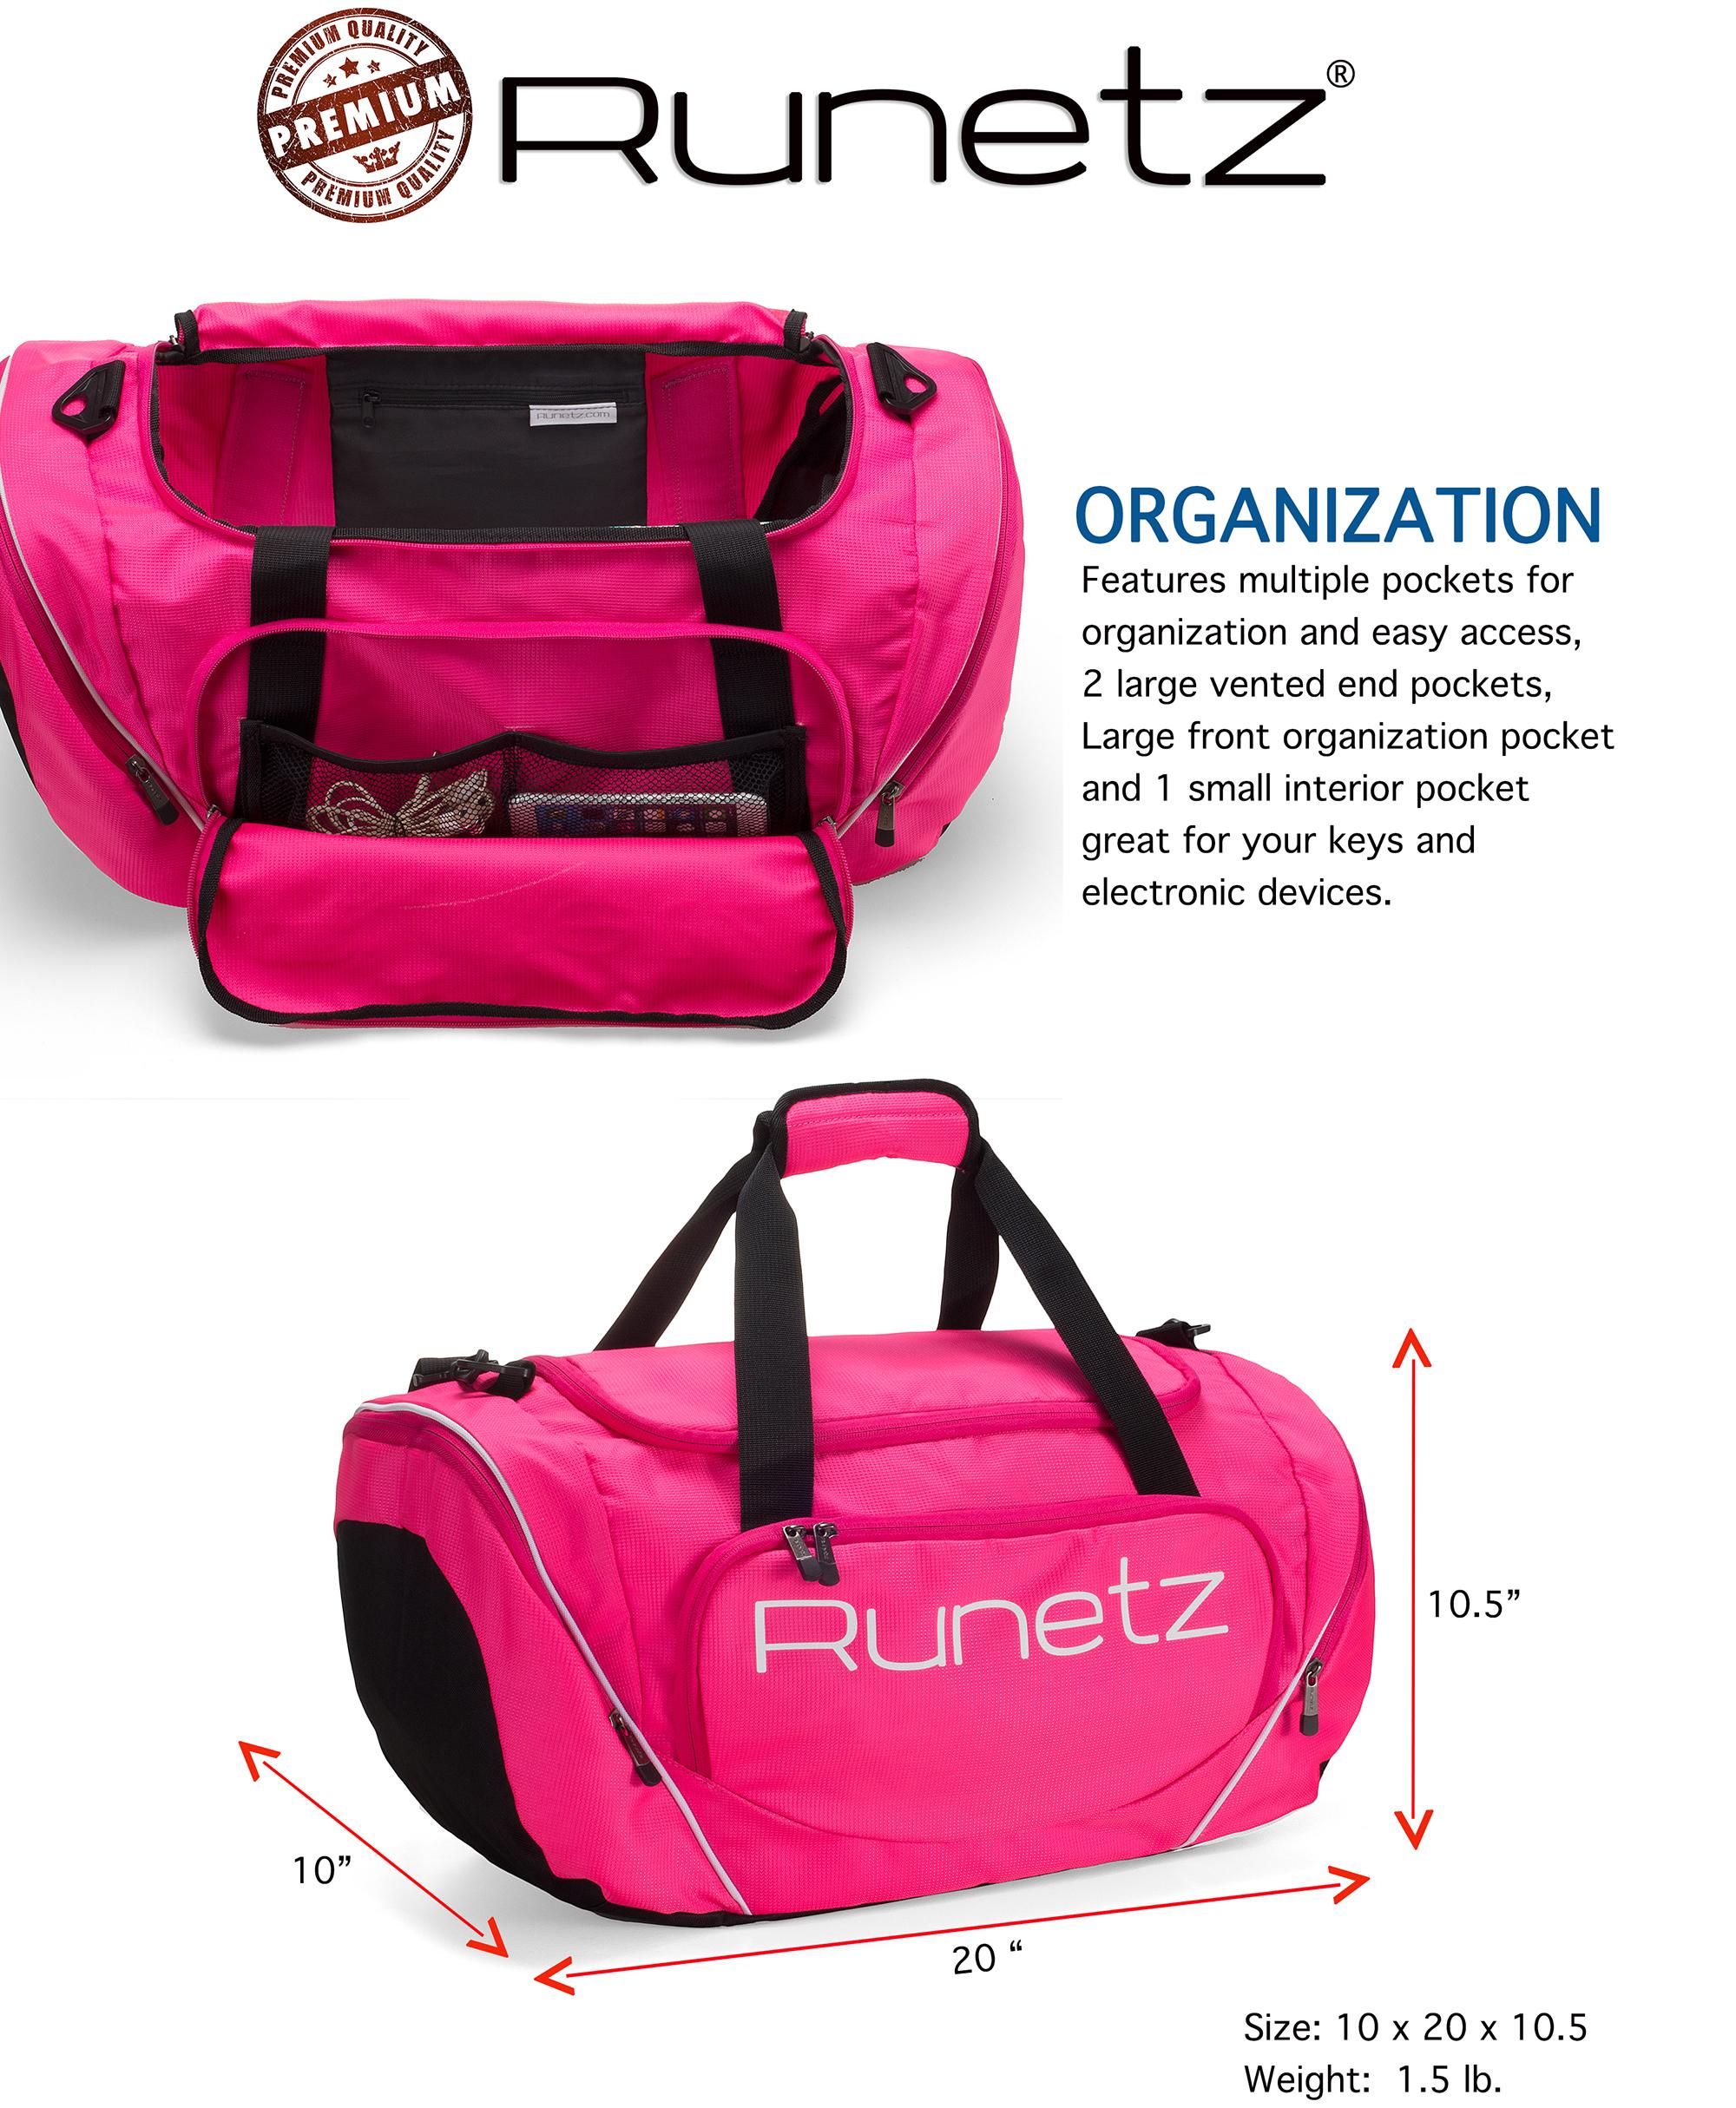 Runetz Gym Duffle Bag - Sports Bag for Men and Women - Ideal Workout 9140c33e72ce1